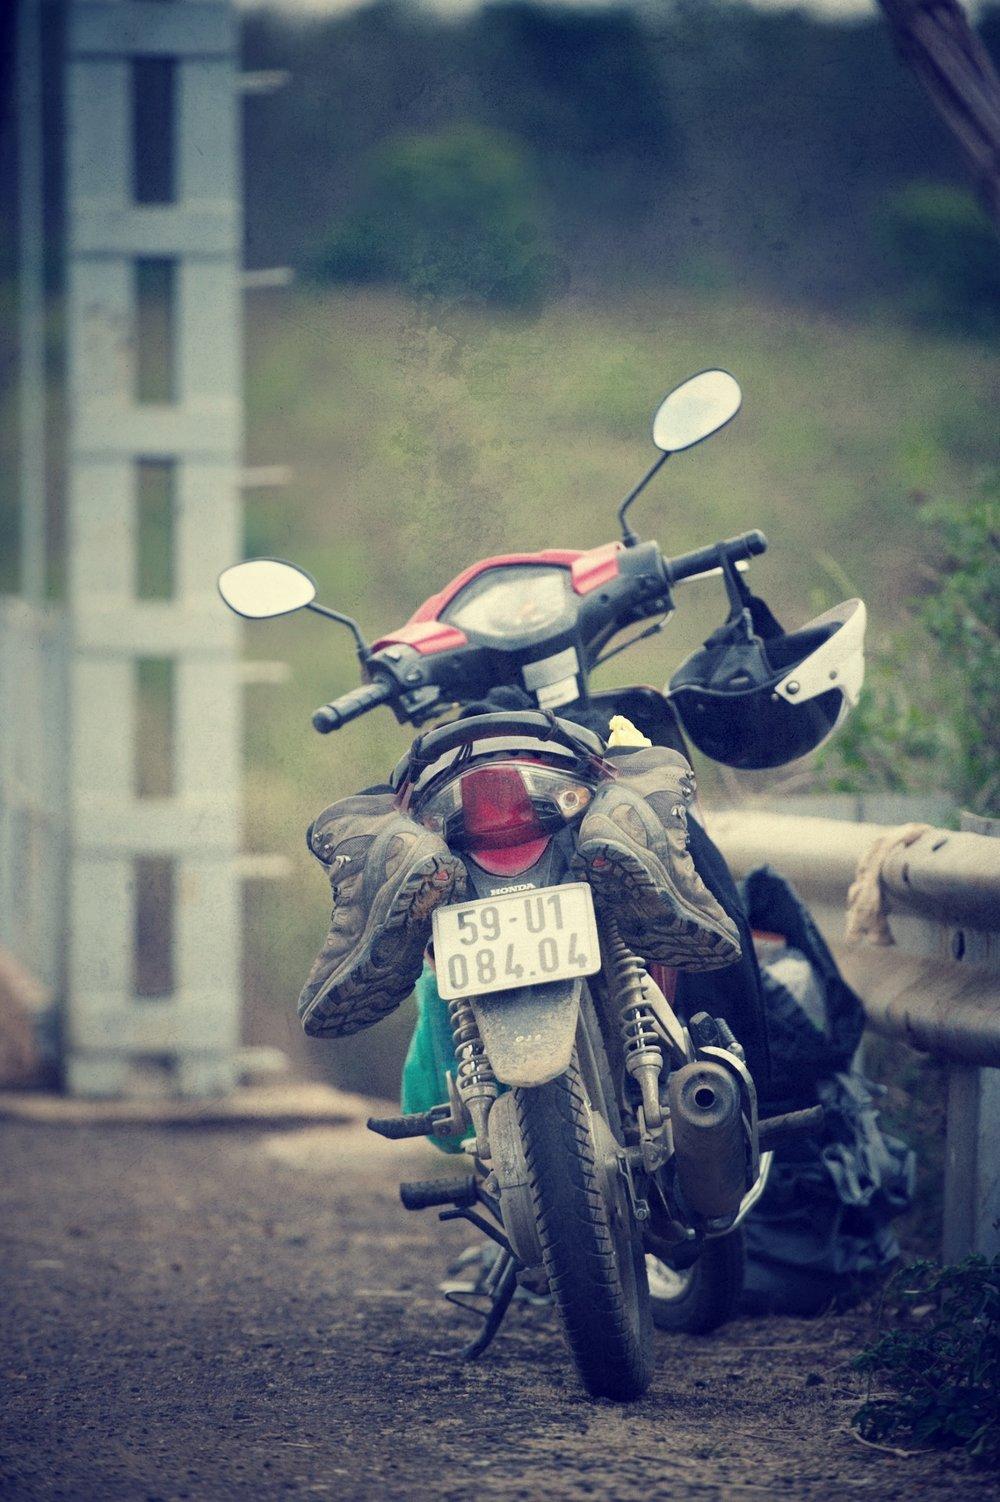 My small 125cc motorbike in Vietnam, way back in 2012.